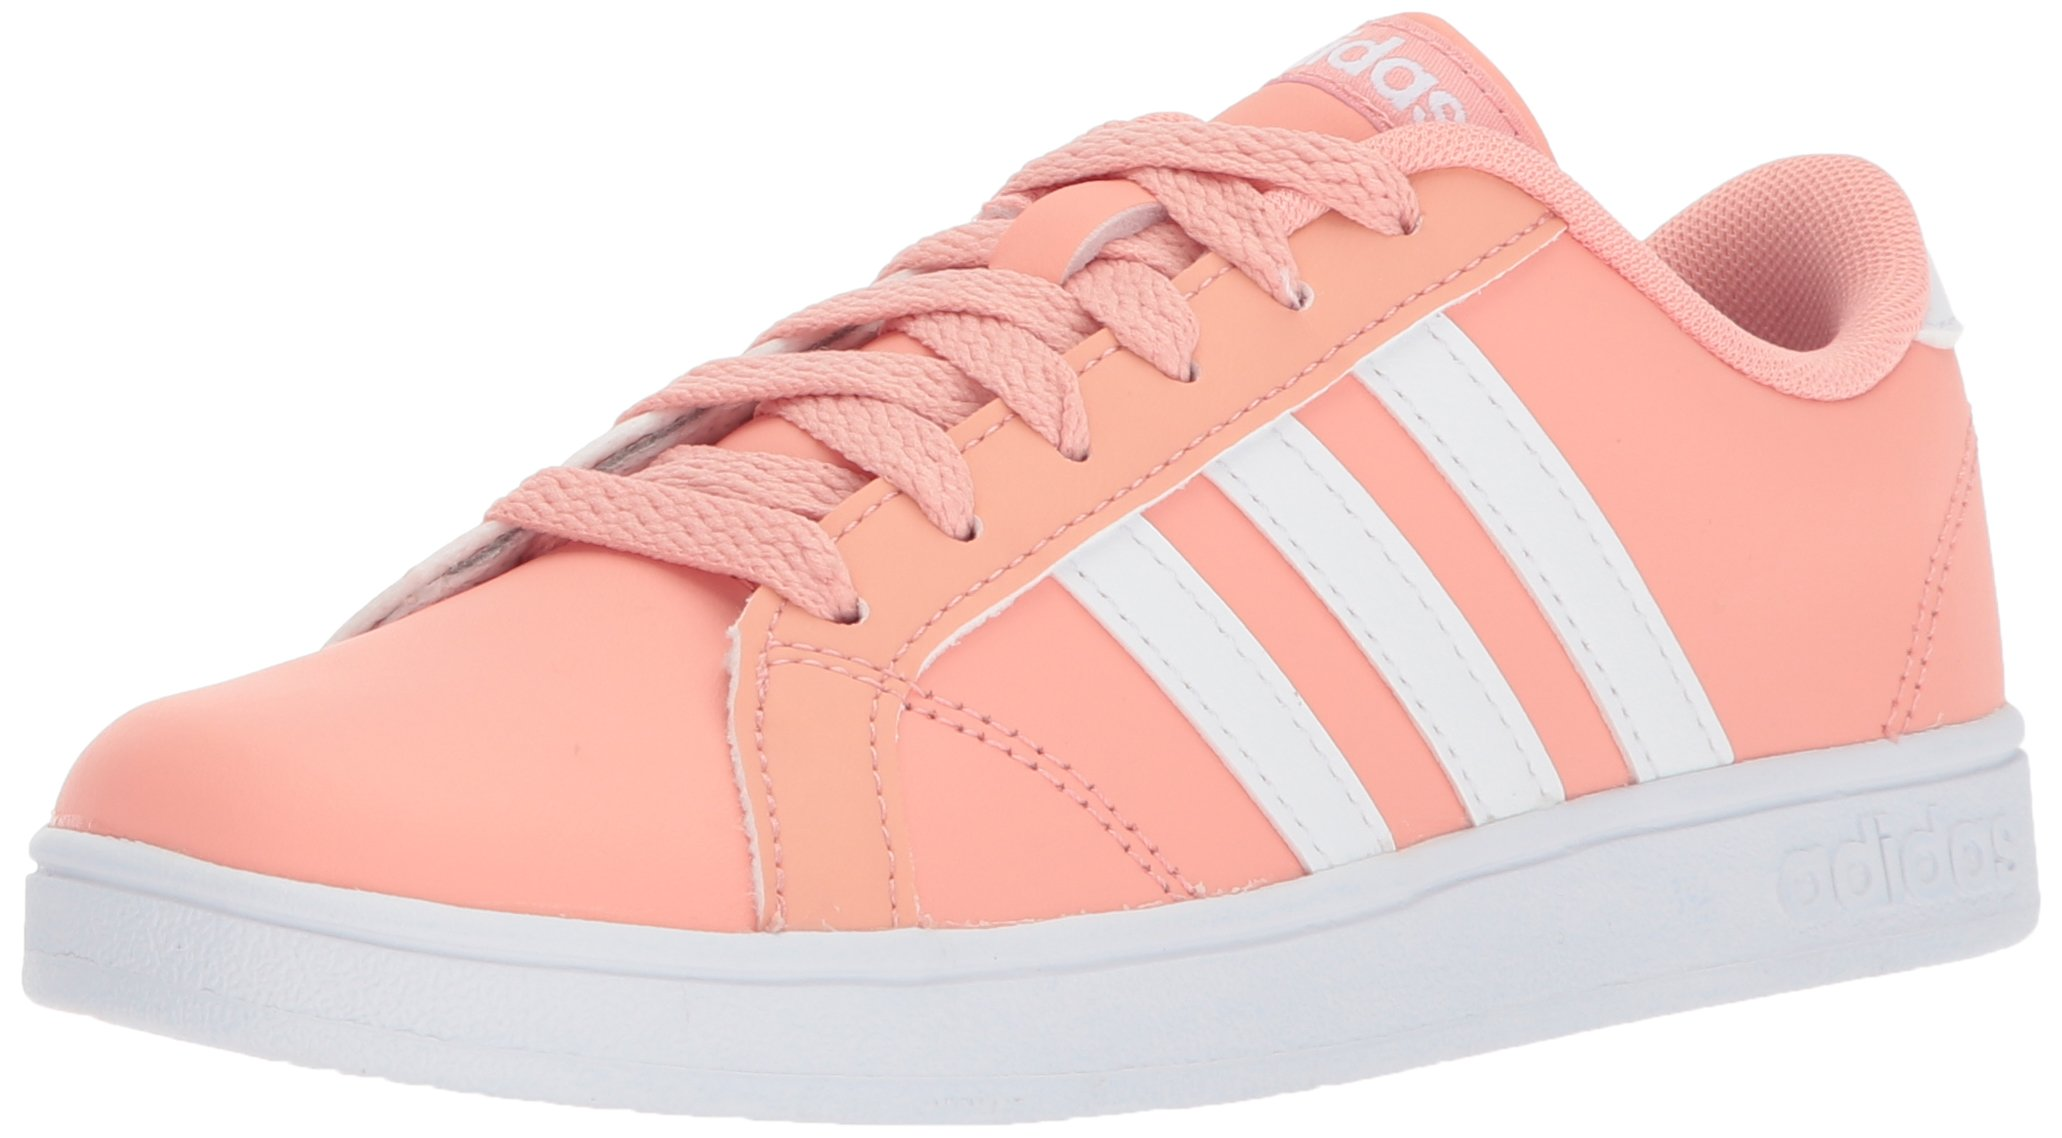 CIOR Boys Girls Breathable Lightweight Sneakers Antislip Shoes For Running Walking Toddler/Little Kid/Big Kid SC276 Pink 36 cxjmu